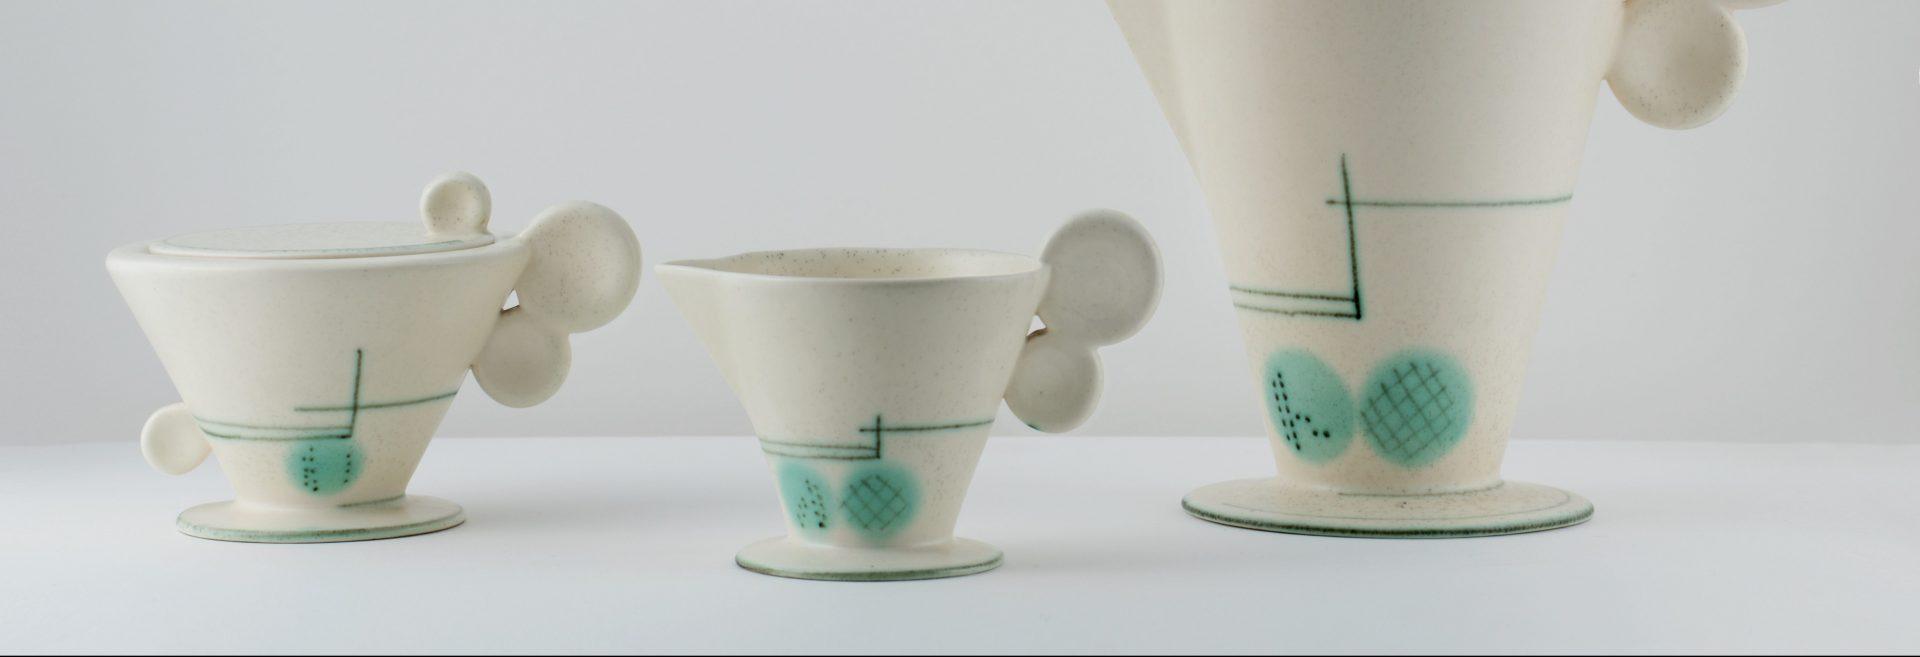 Immer Keramik oder Weberei